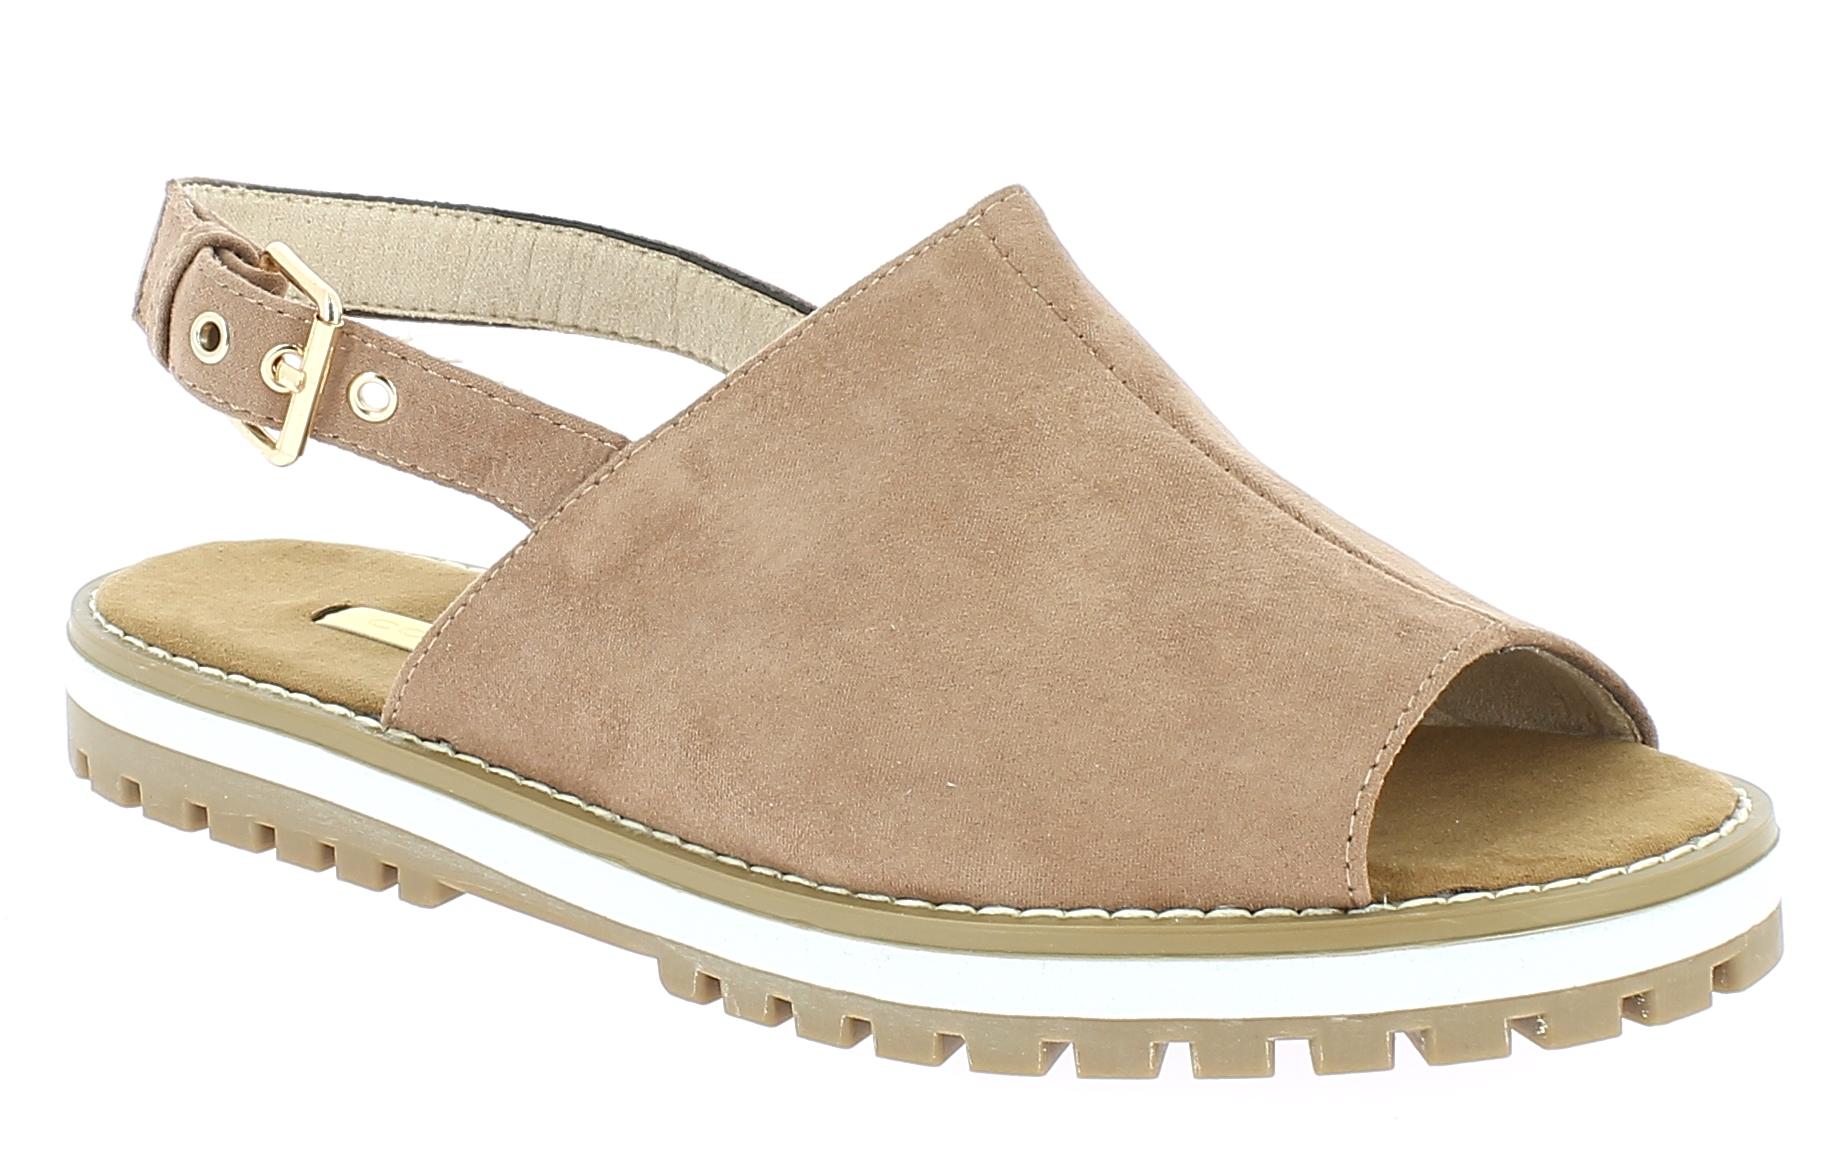 CORINA Γυναικείο Πέδιλο C7342 Ρόζ - IqShoes - C7342 PINK-pink-37/1/11/27 παπούτσια  πέδιλα